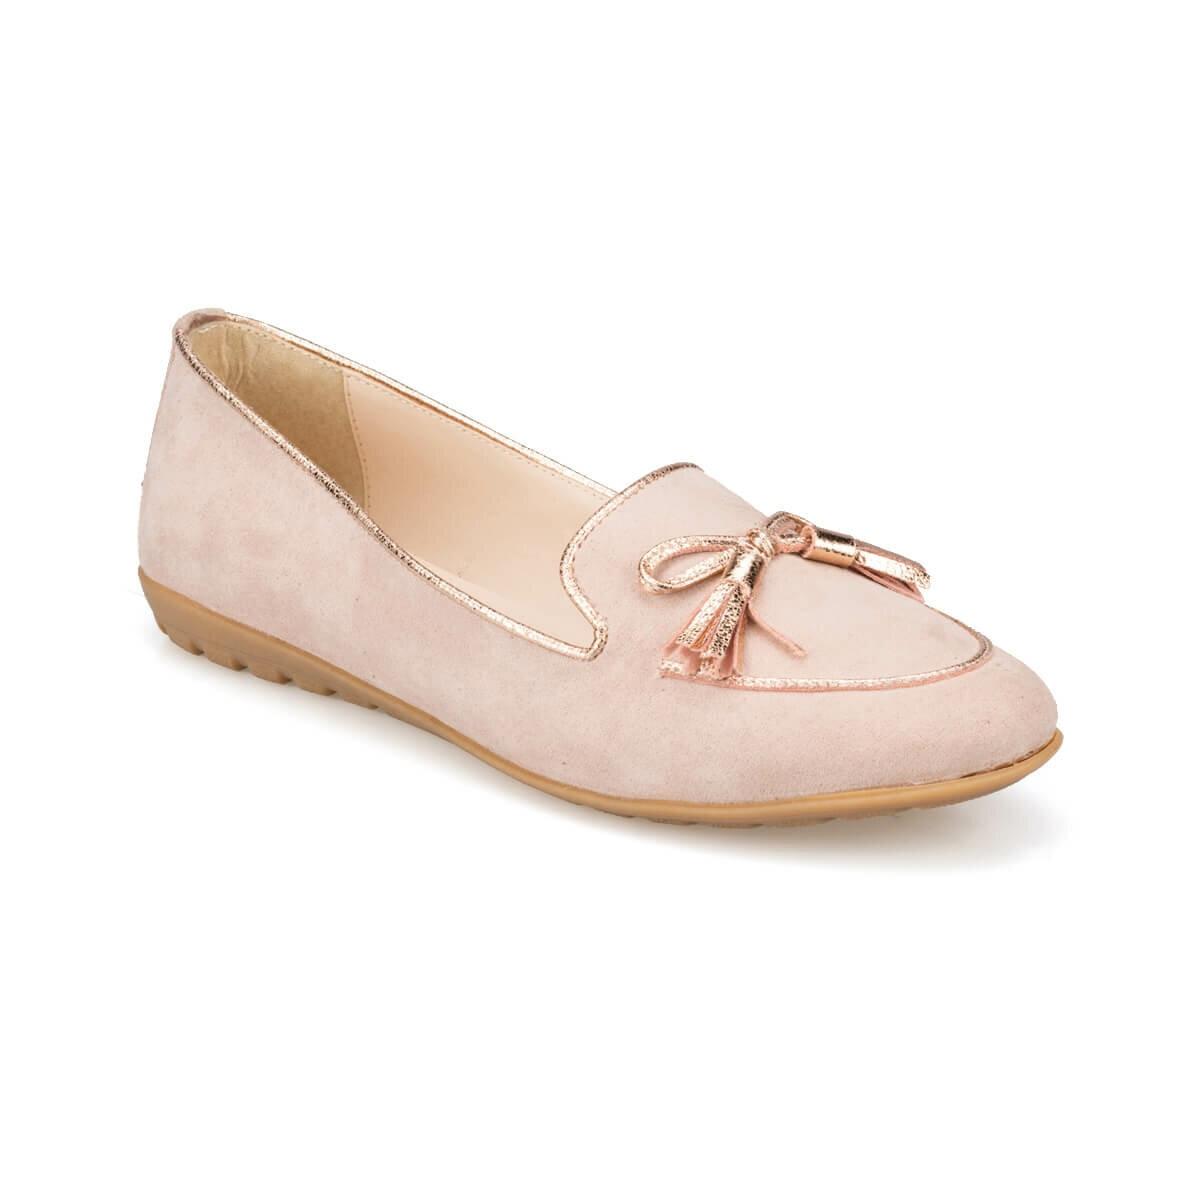 FLO 91. 313056.Z Powder Women 'S Loafer Shoes Polaris